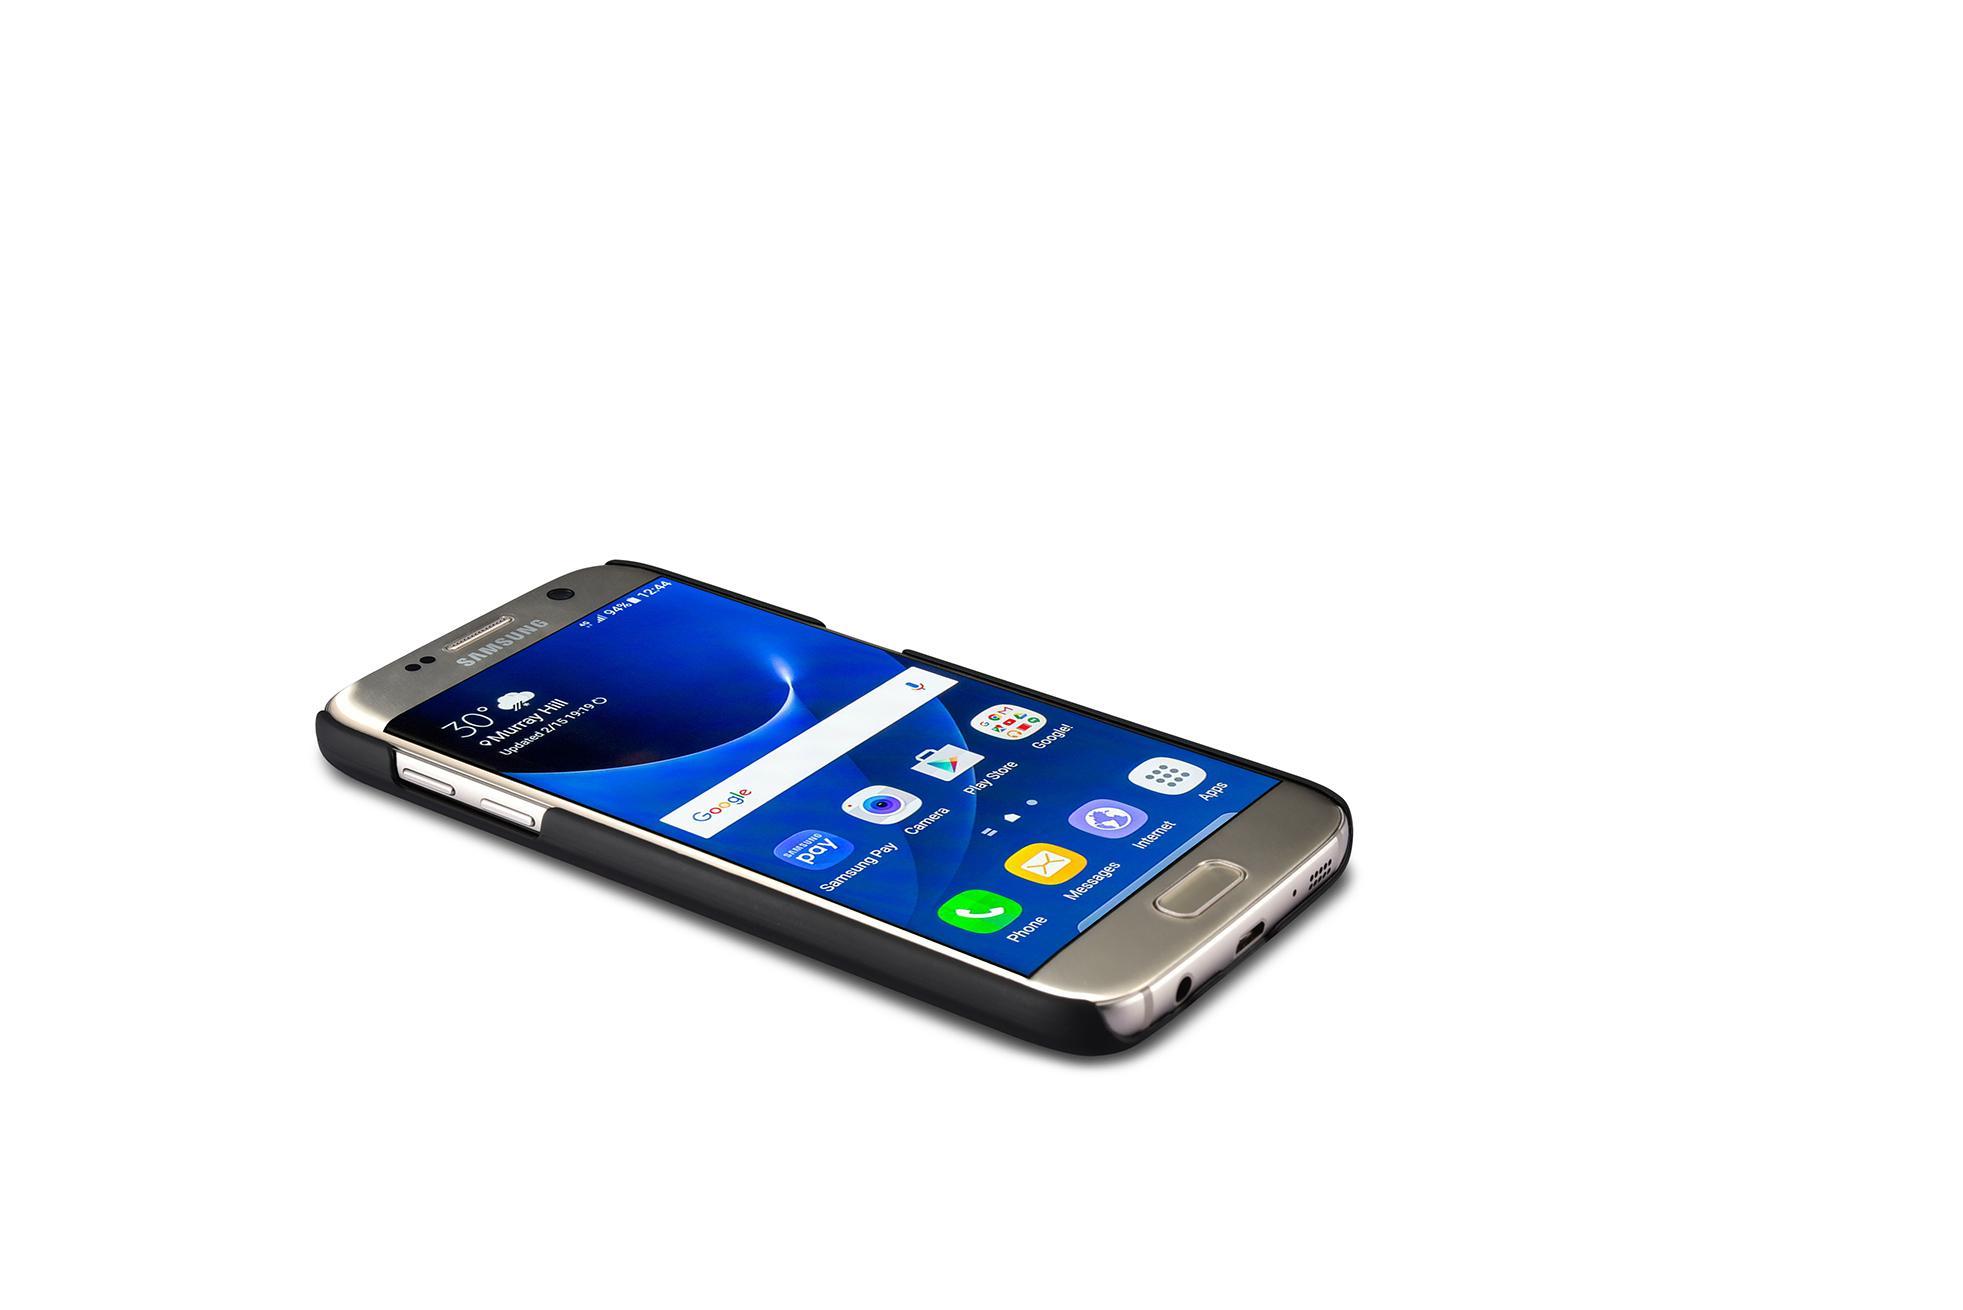 iCarer Samsung Galaxy S7 Silmarillion Leather Detachable 2in1 Wallet Folio Case 5